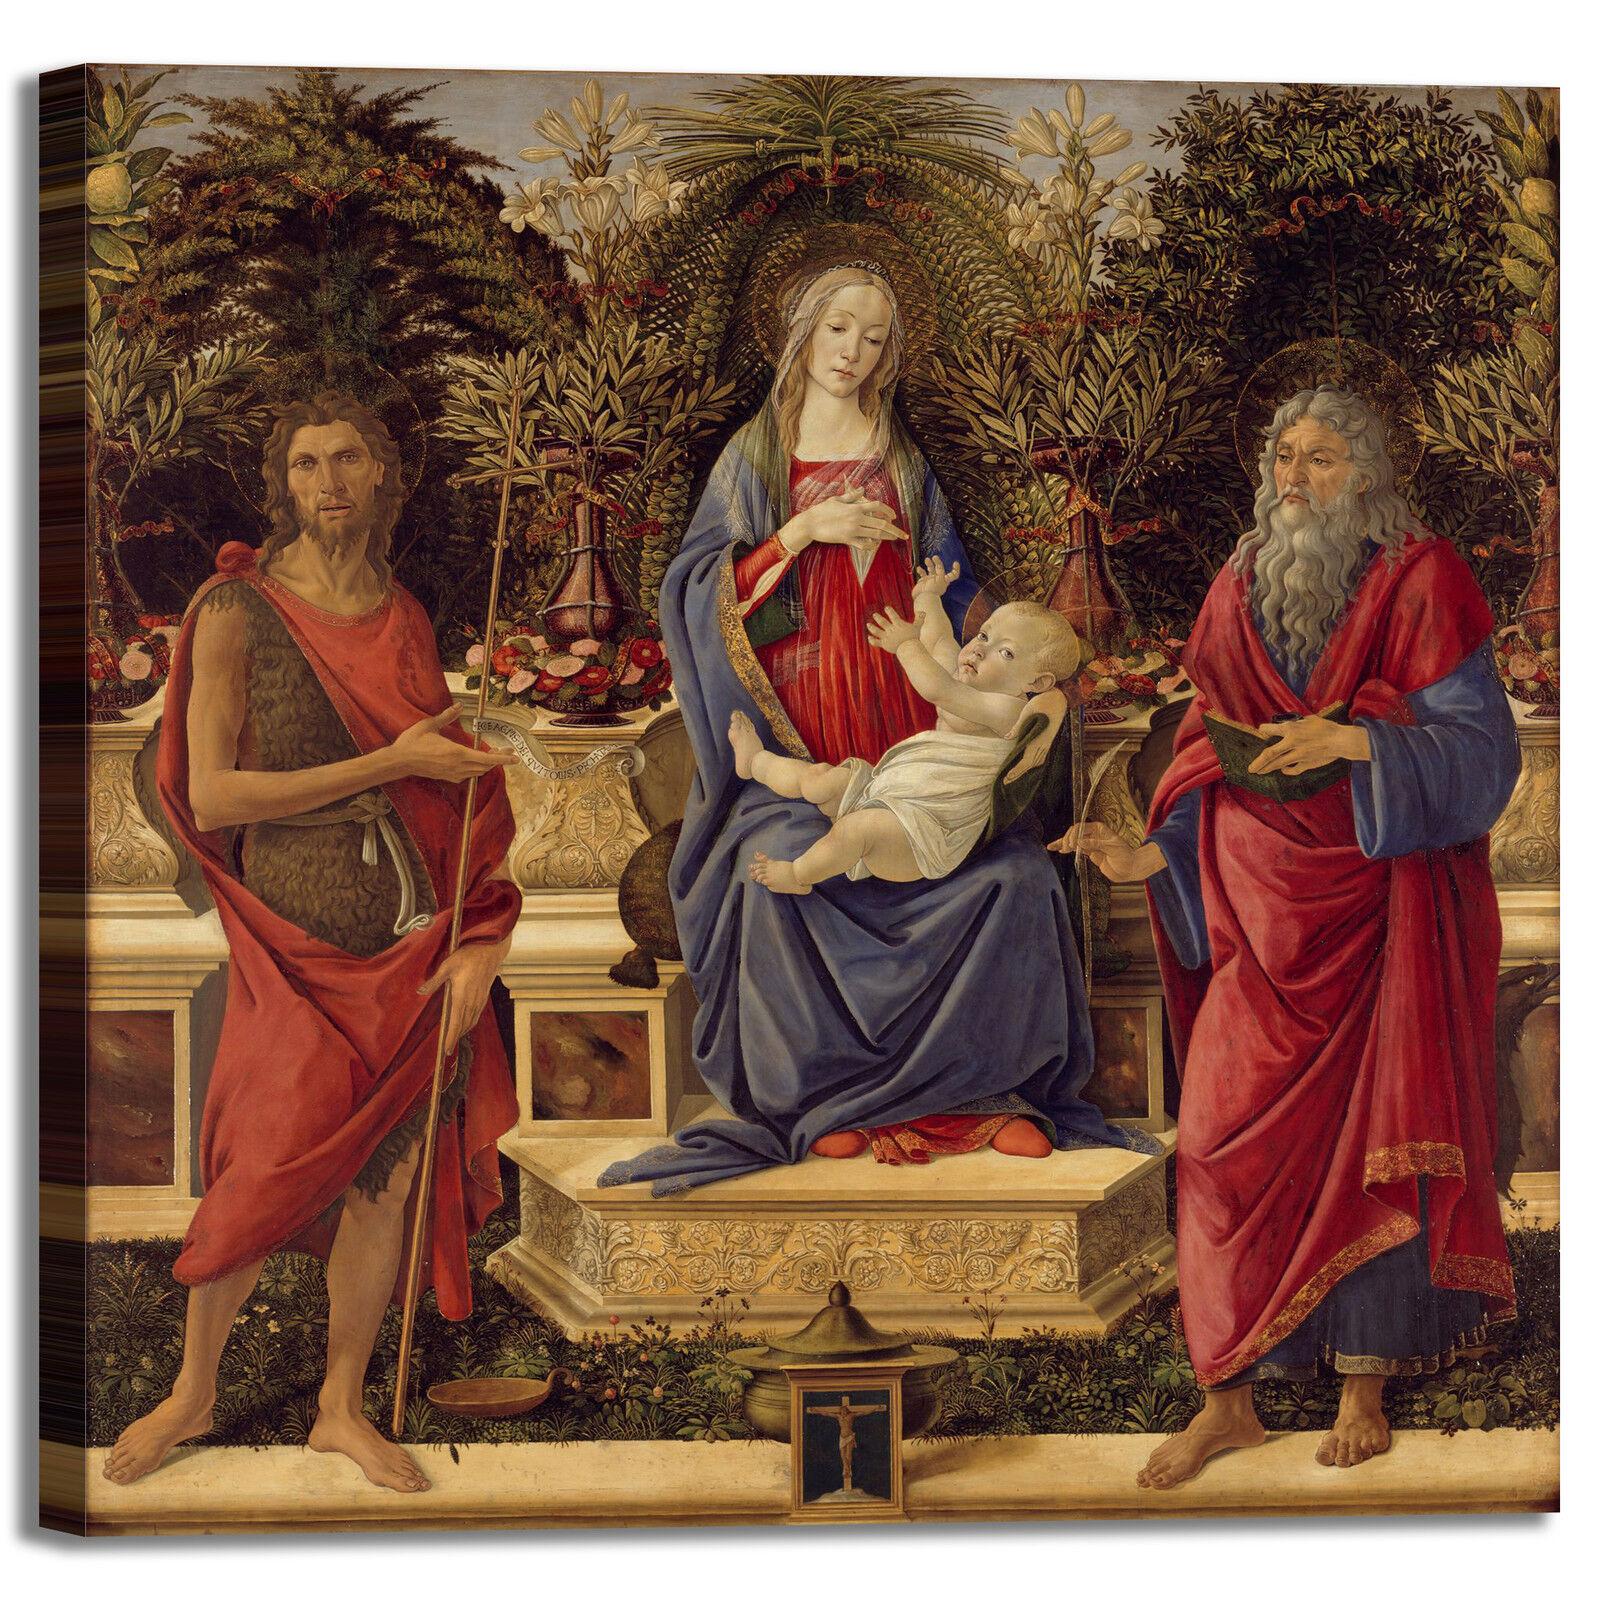 Botticelli Madonna e santi design quadro stampa tela dipinto telaio telaio telaio arrossoo casa adf6ce